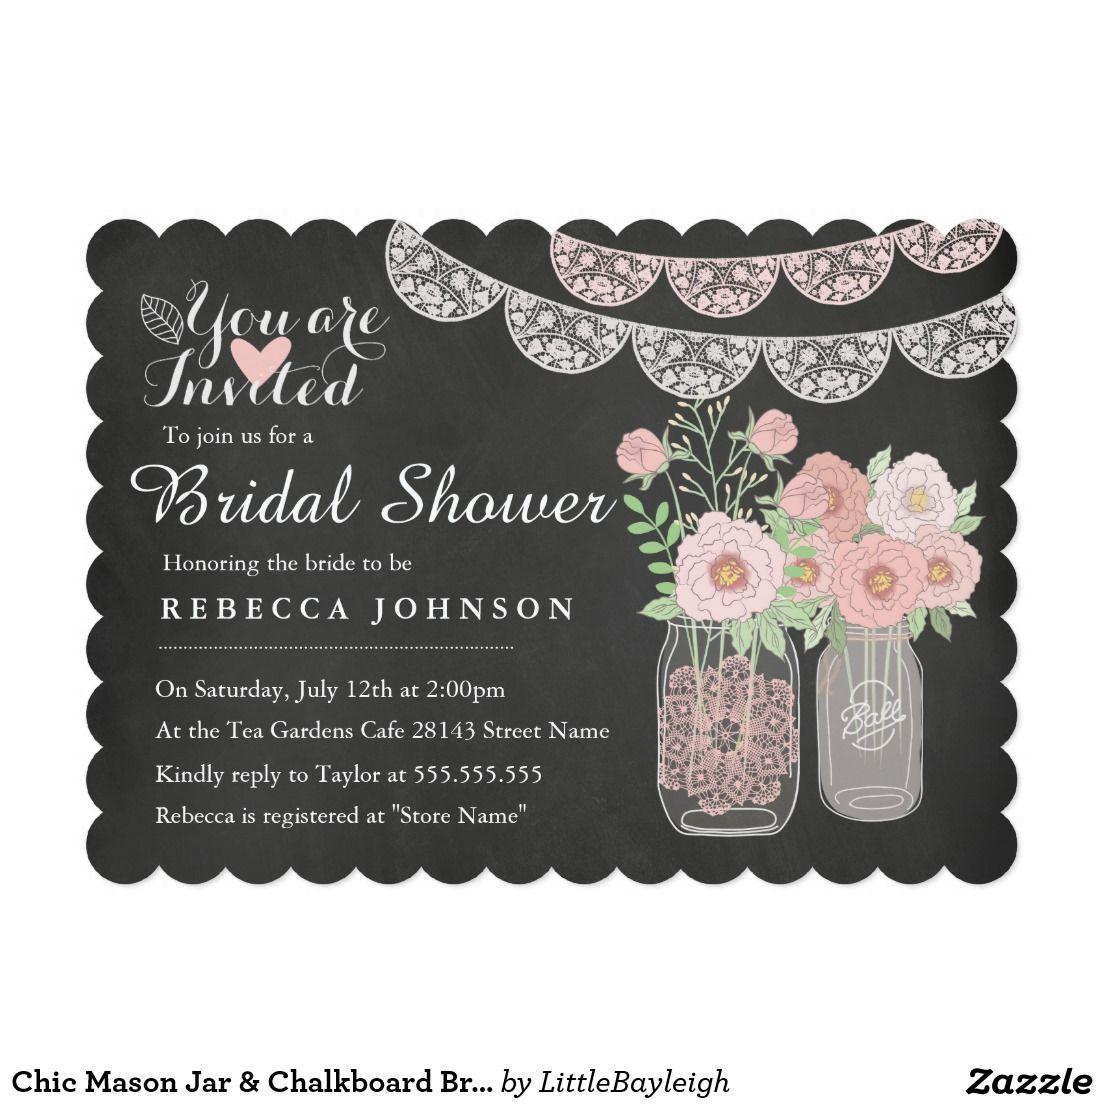 Chic Mason Jar  Chalkboard Bridal Shower Invite Elegant